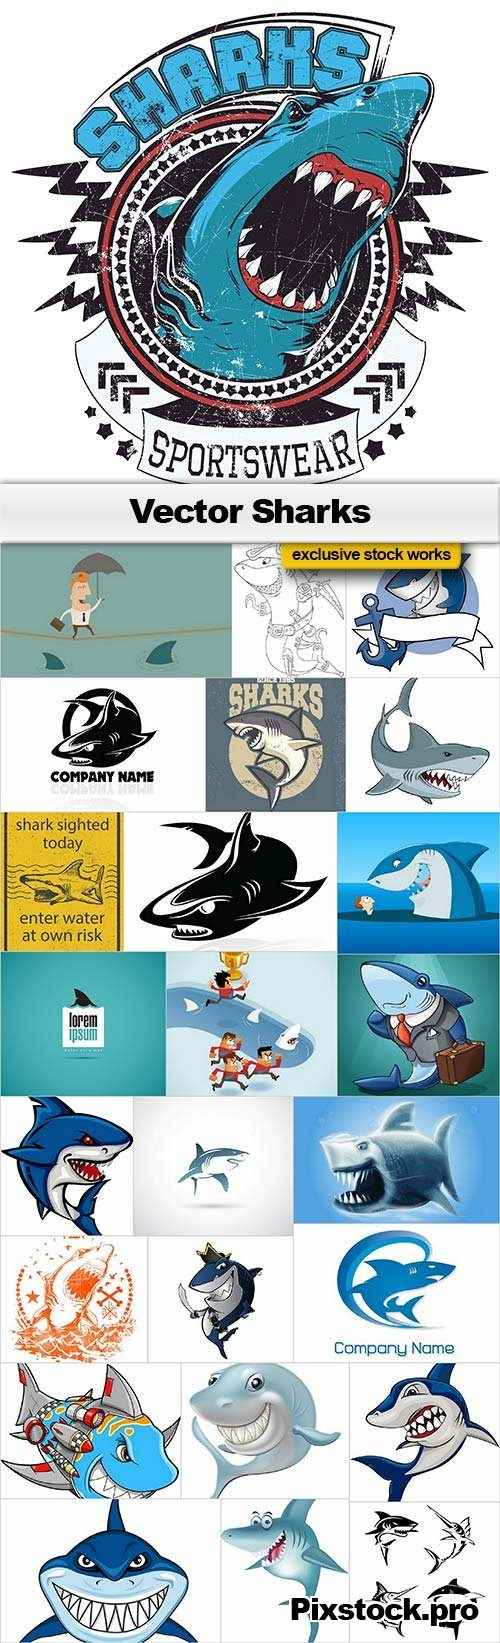 Vector Sharks